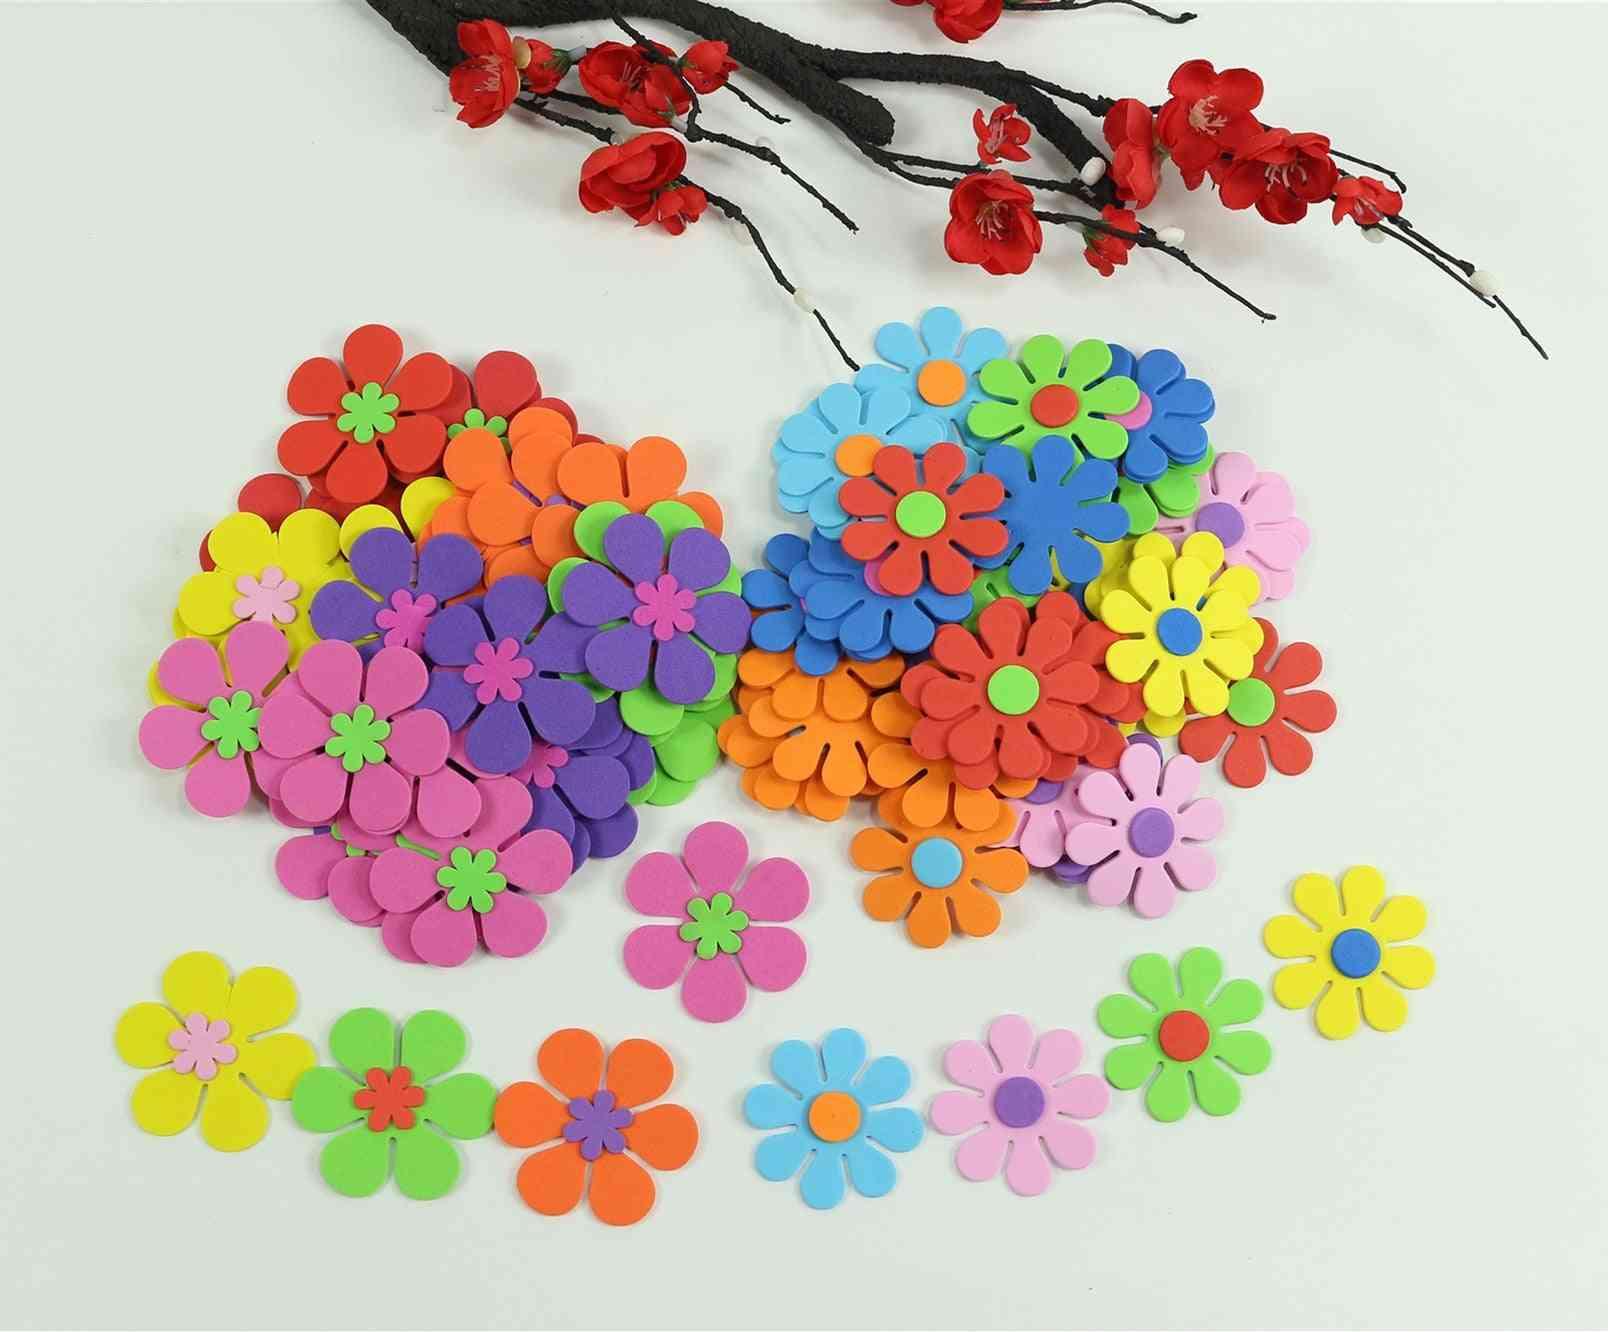 Mix-flowers Foam-stickers Kids-toy, Scrapbooking Kit, Early-educational Diy Toys